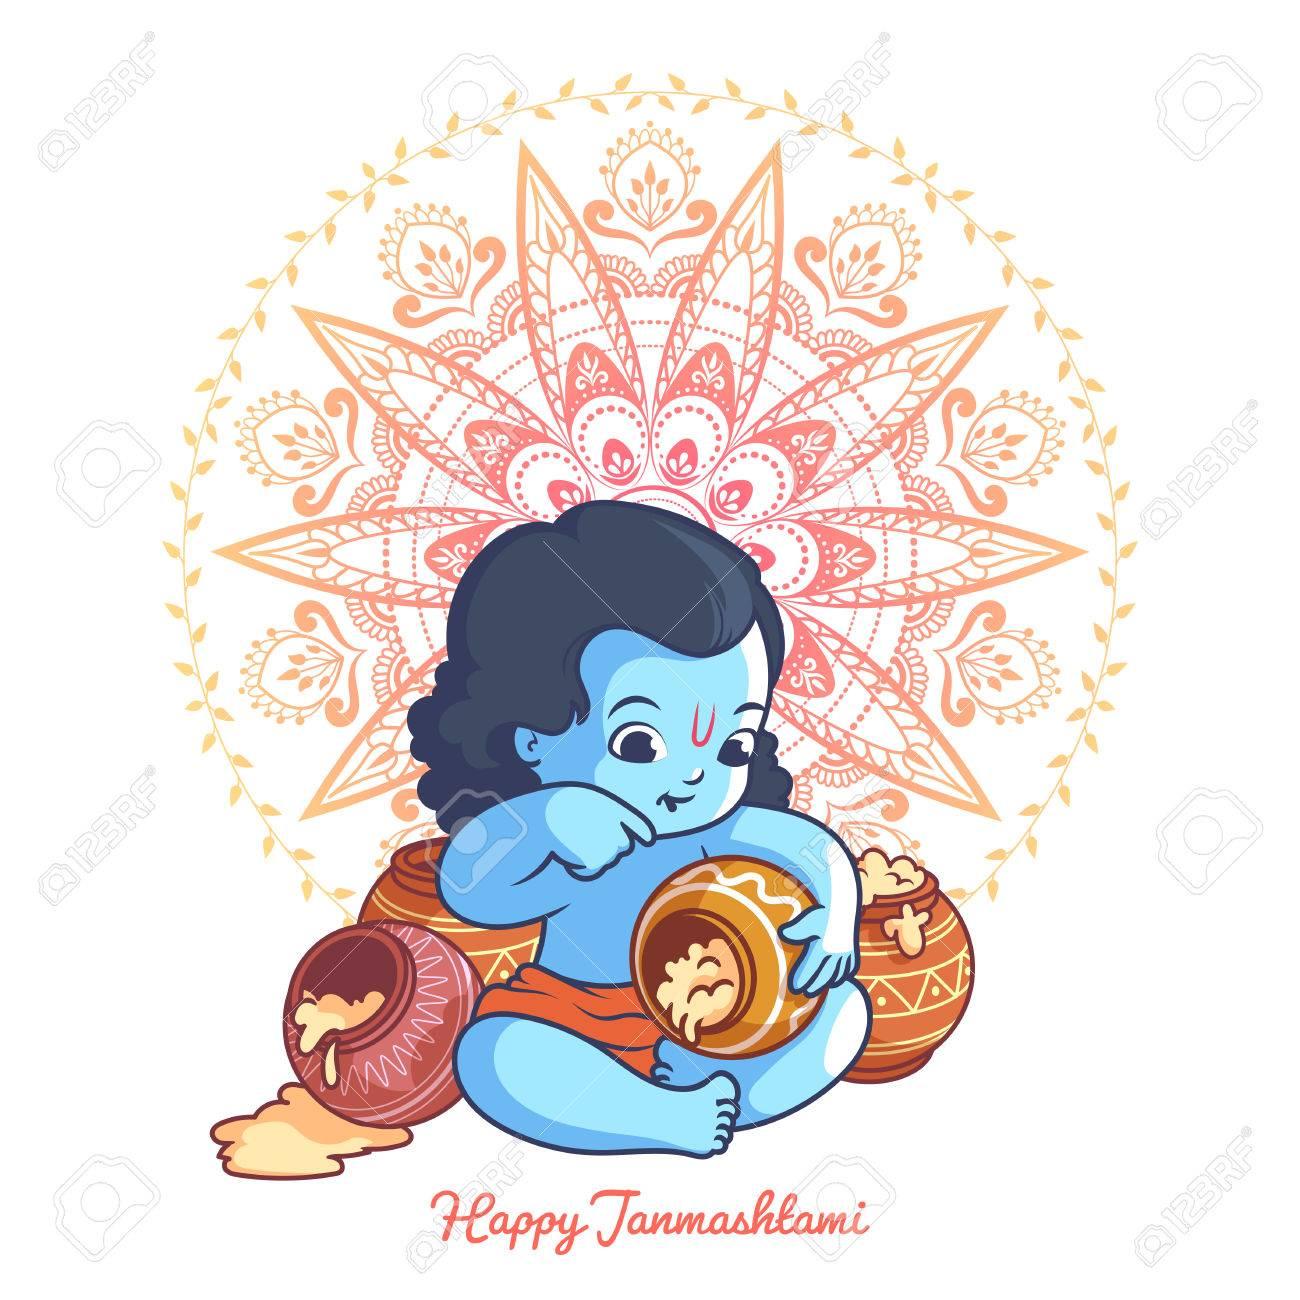 Kleine Comic Krishna Mit Einem Topf Makhan Grusskarte Fur Krishna